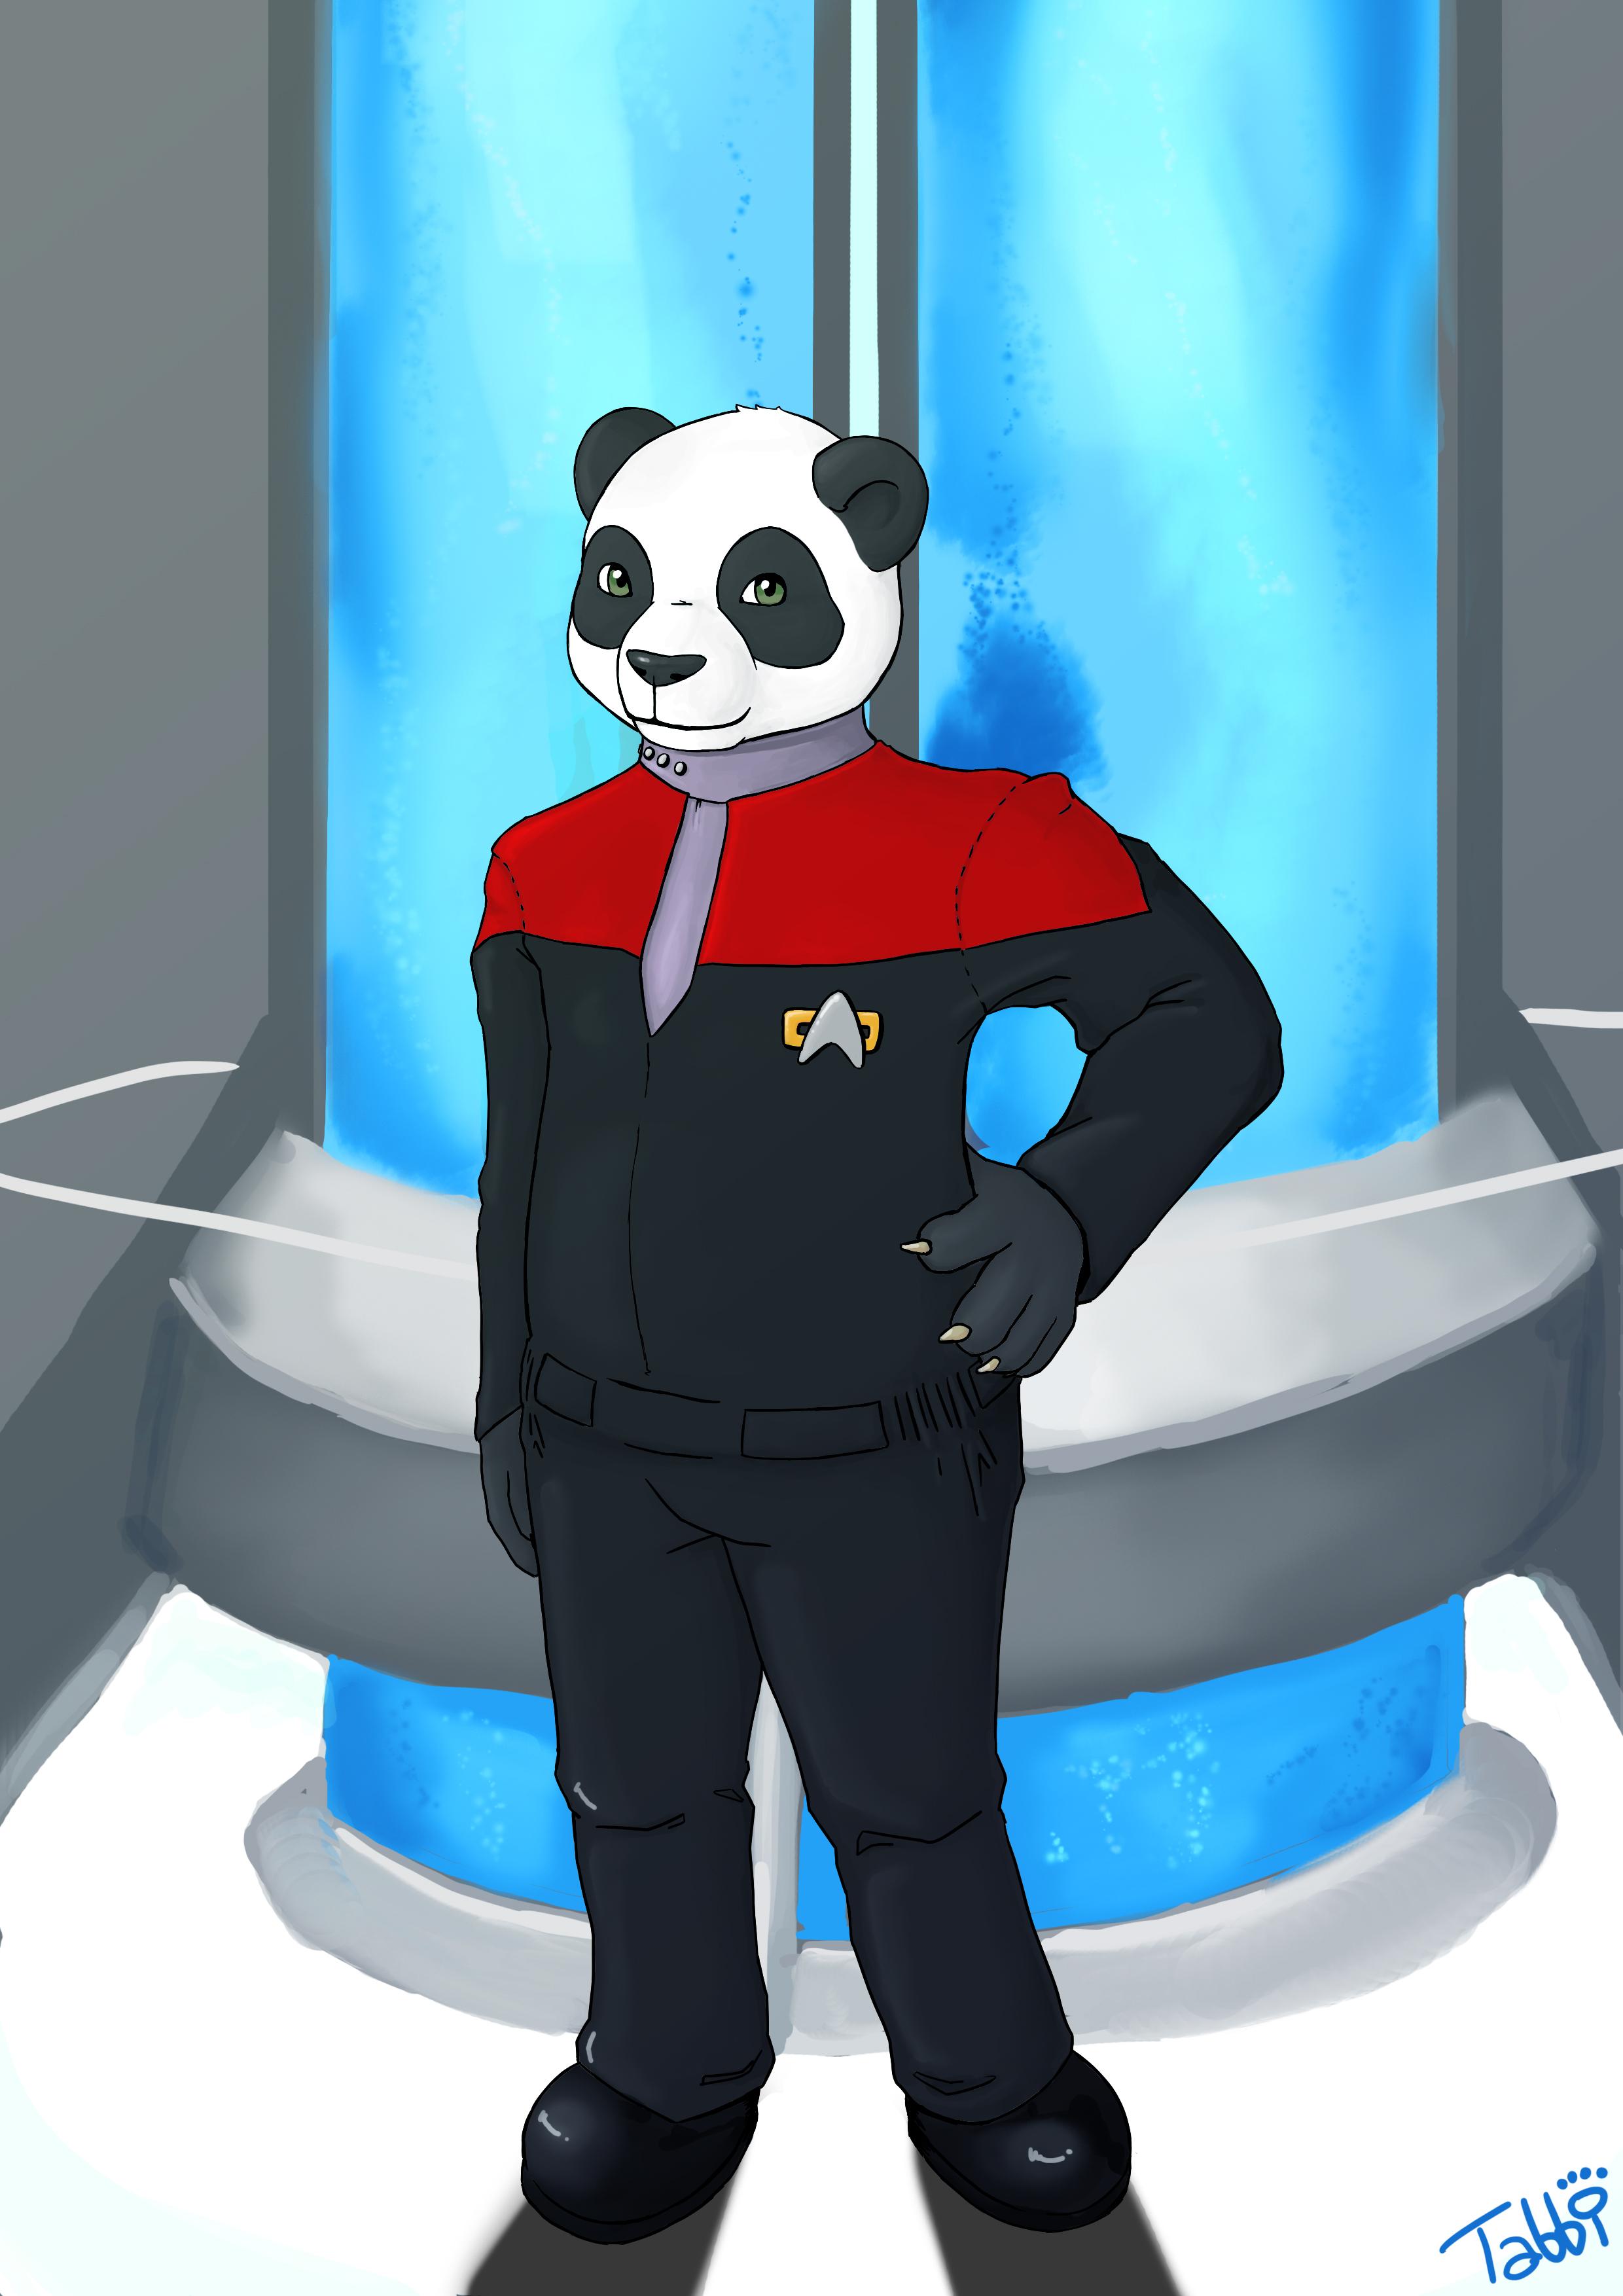 StarTrek Panda